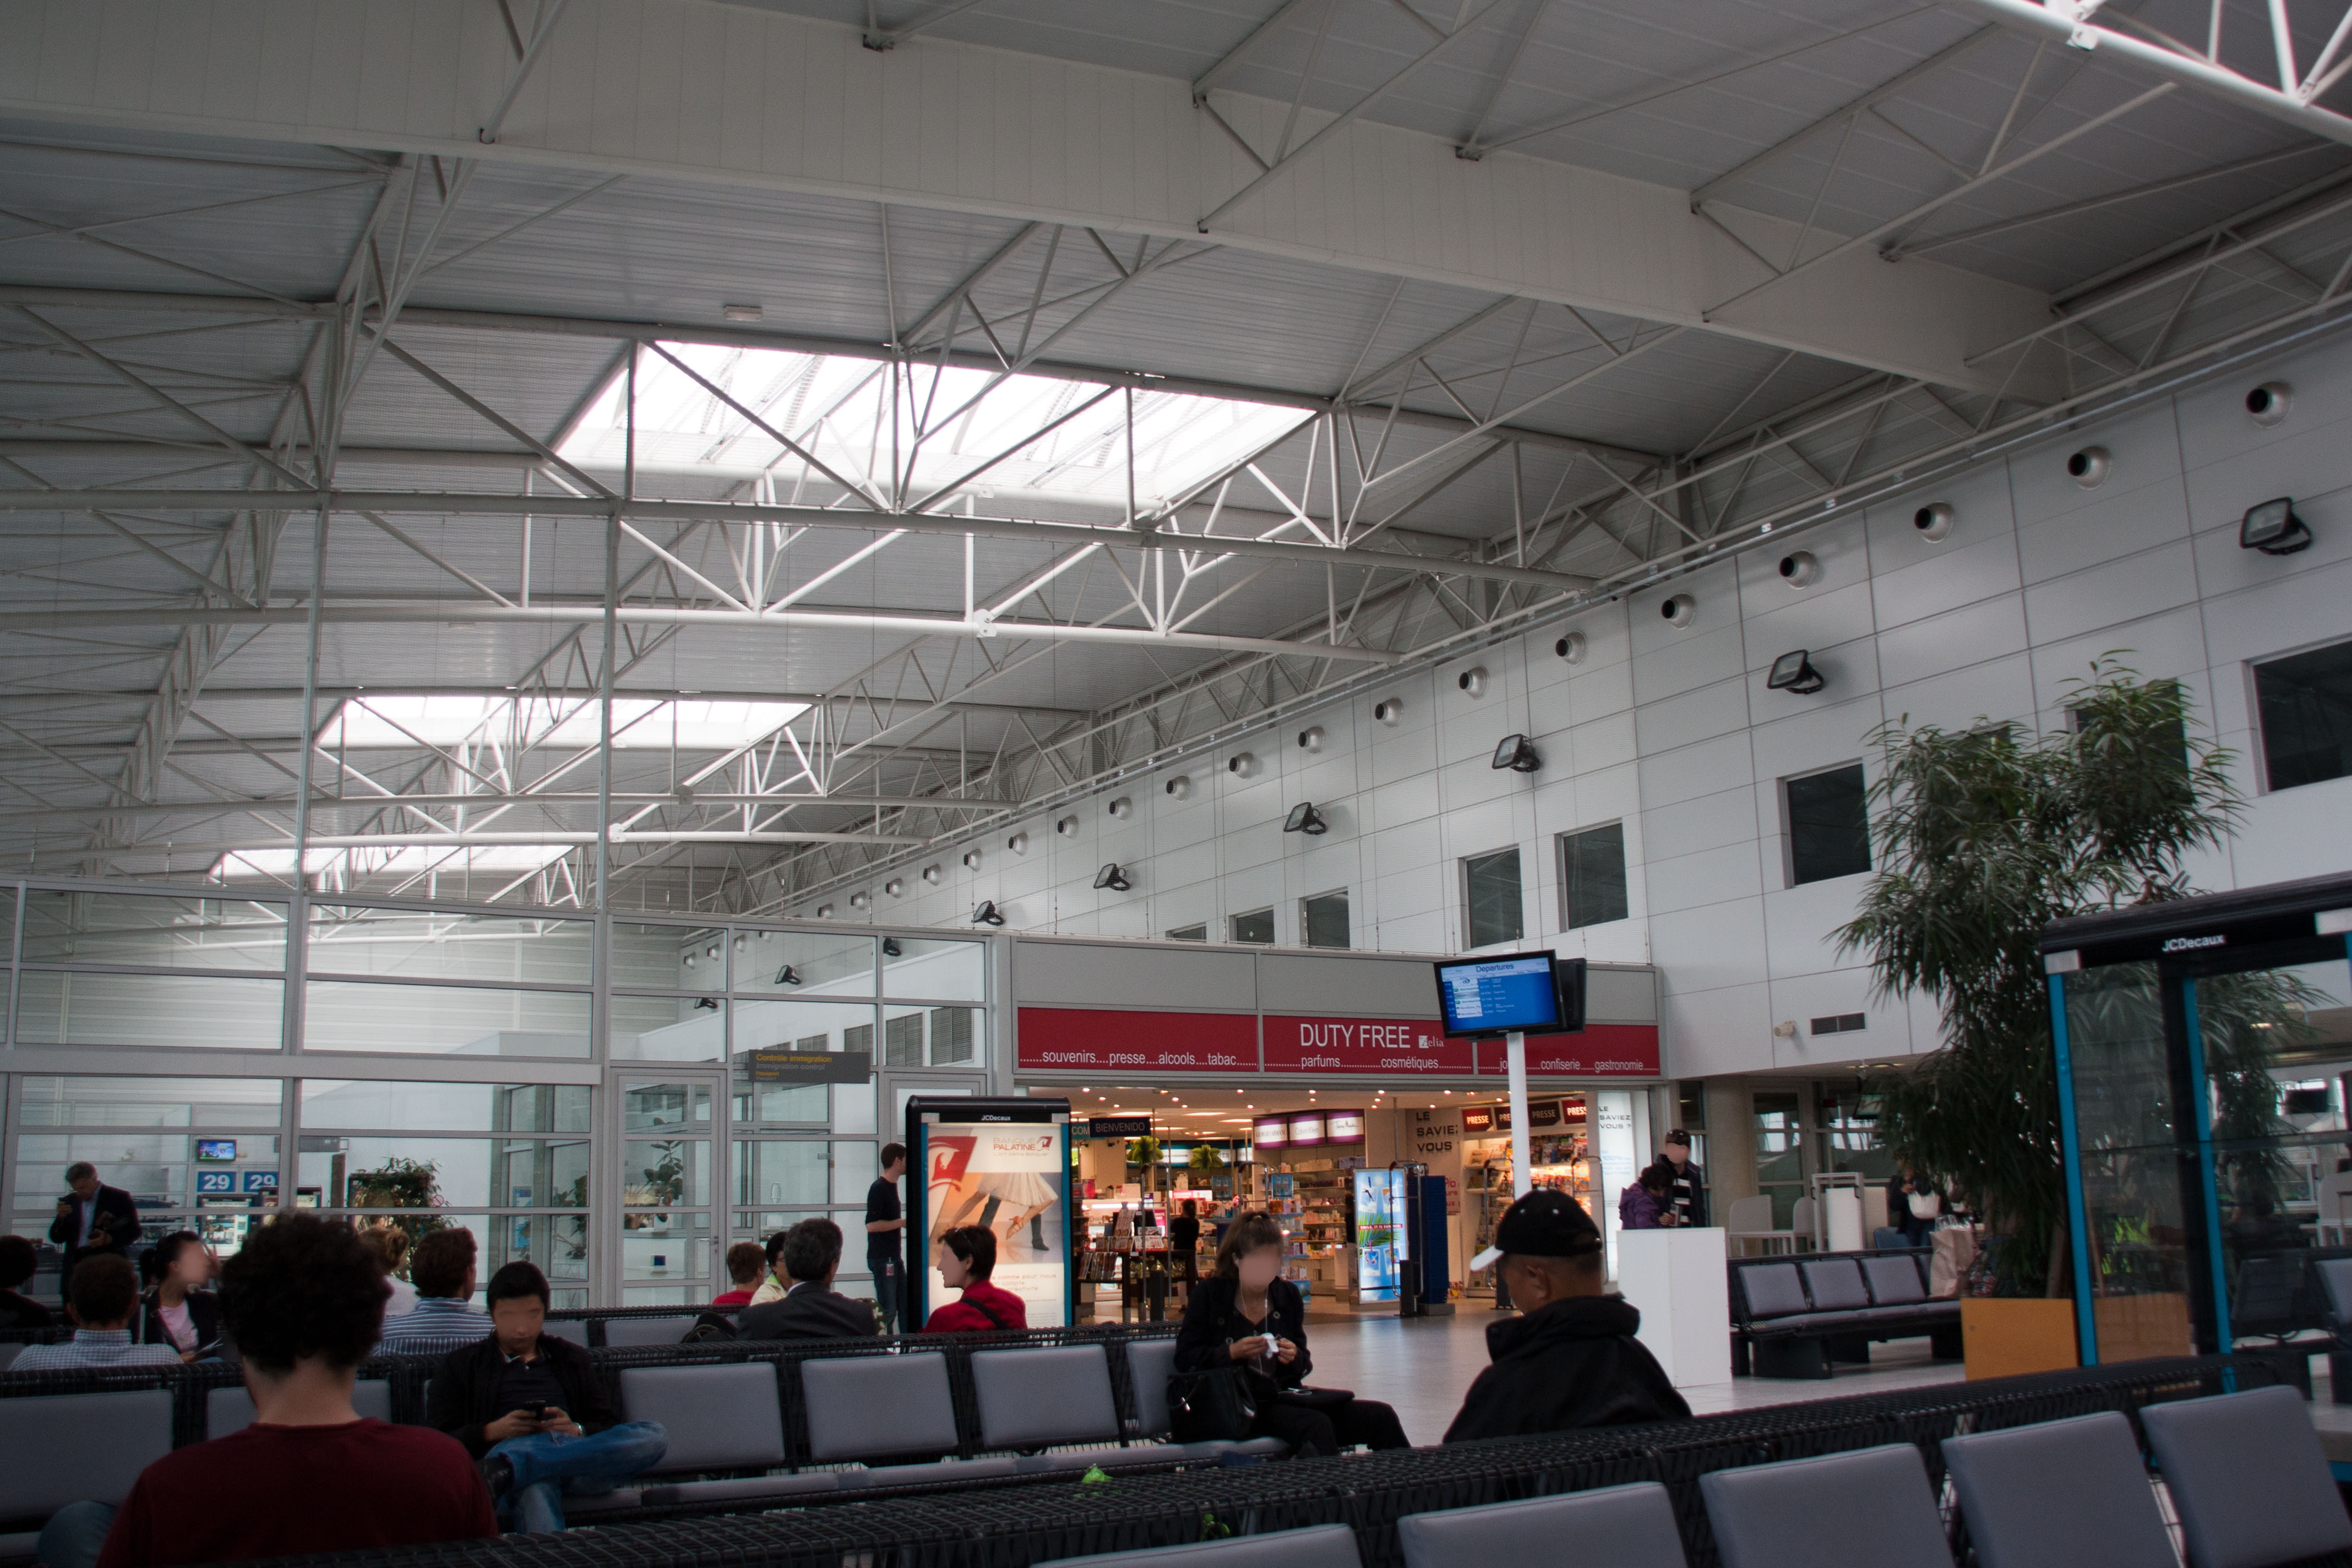 file aeroport tarbes lourdes img 9965 jpg wikimedia commons. Black Bedroom Furniture Sets. Home Design Ideas